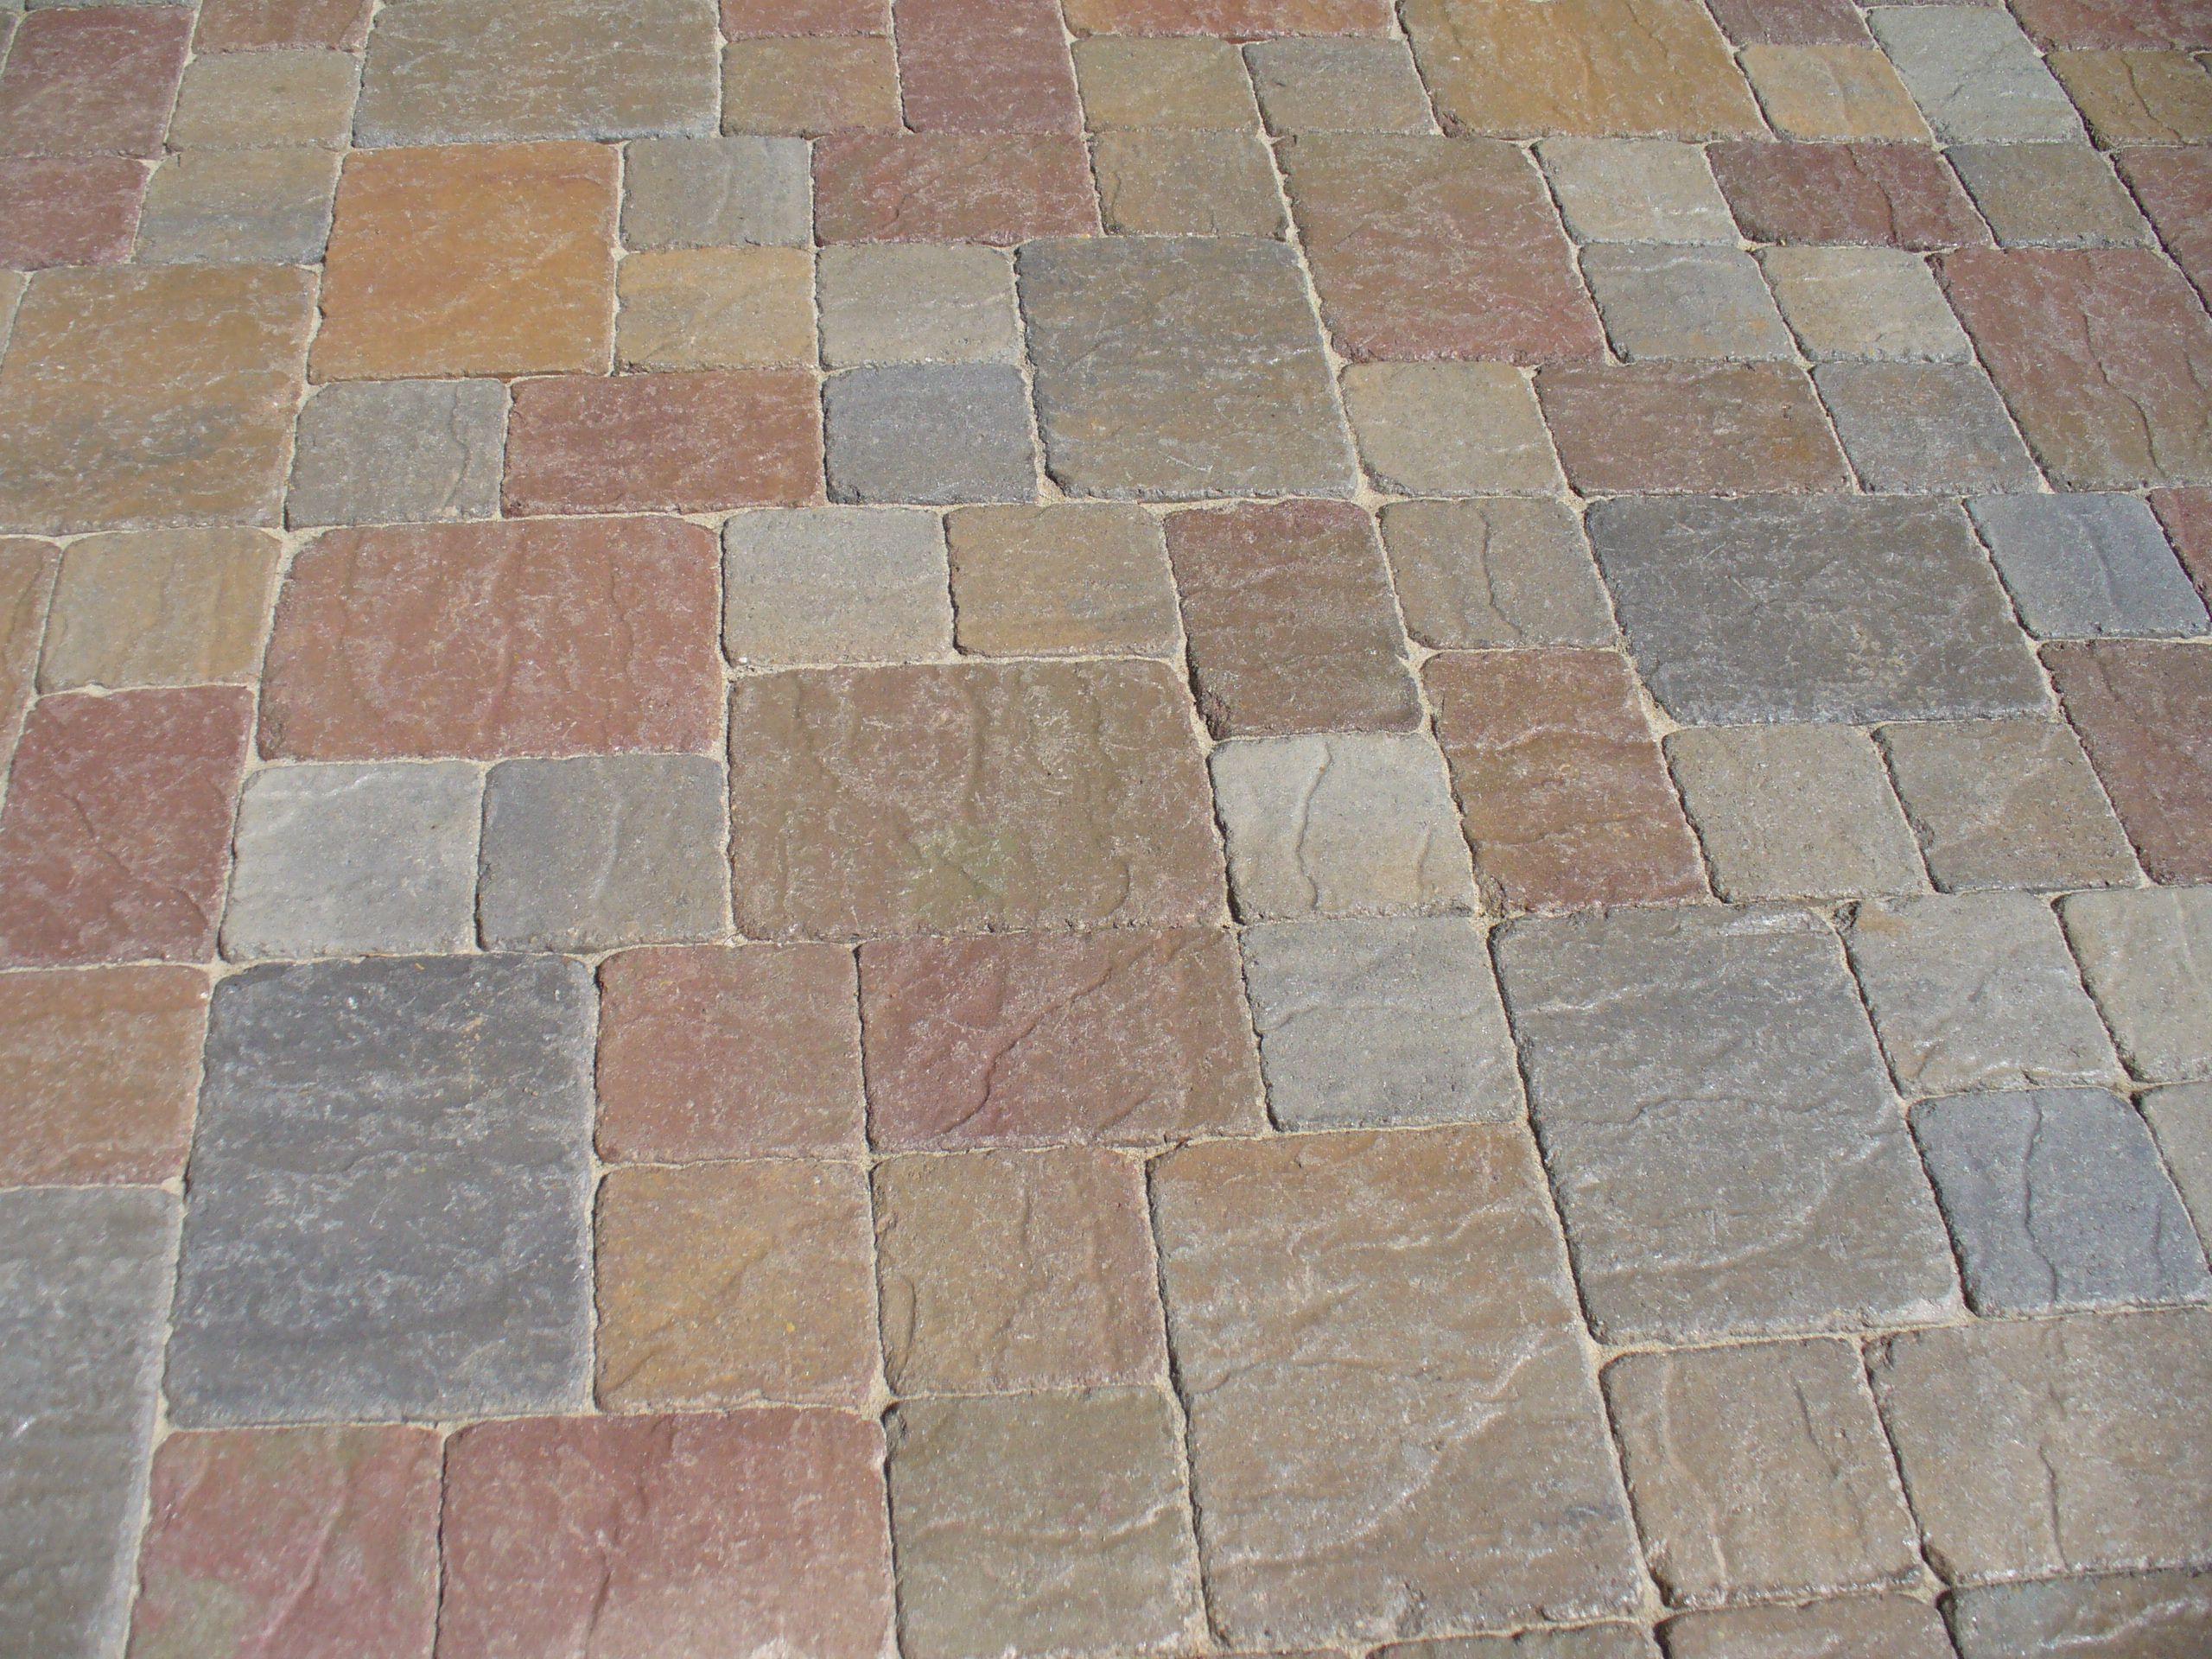 three color random pattern tumbled pavers